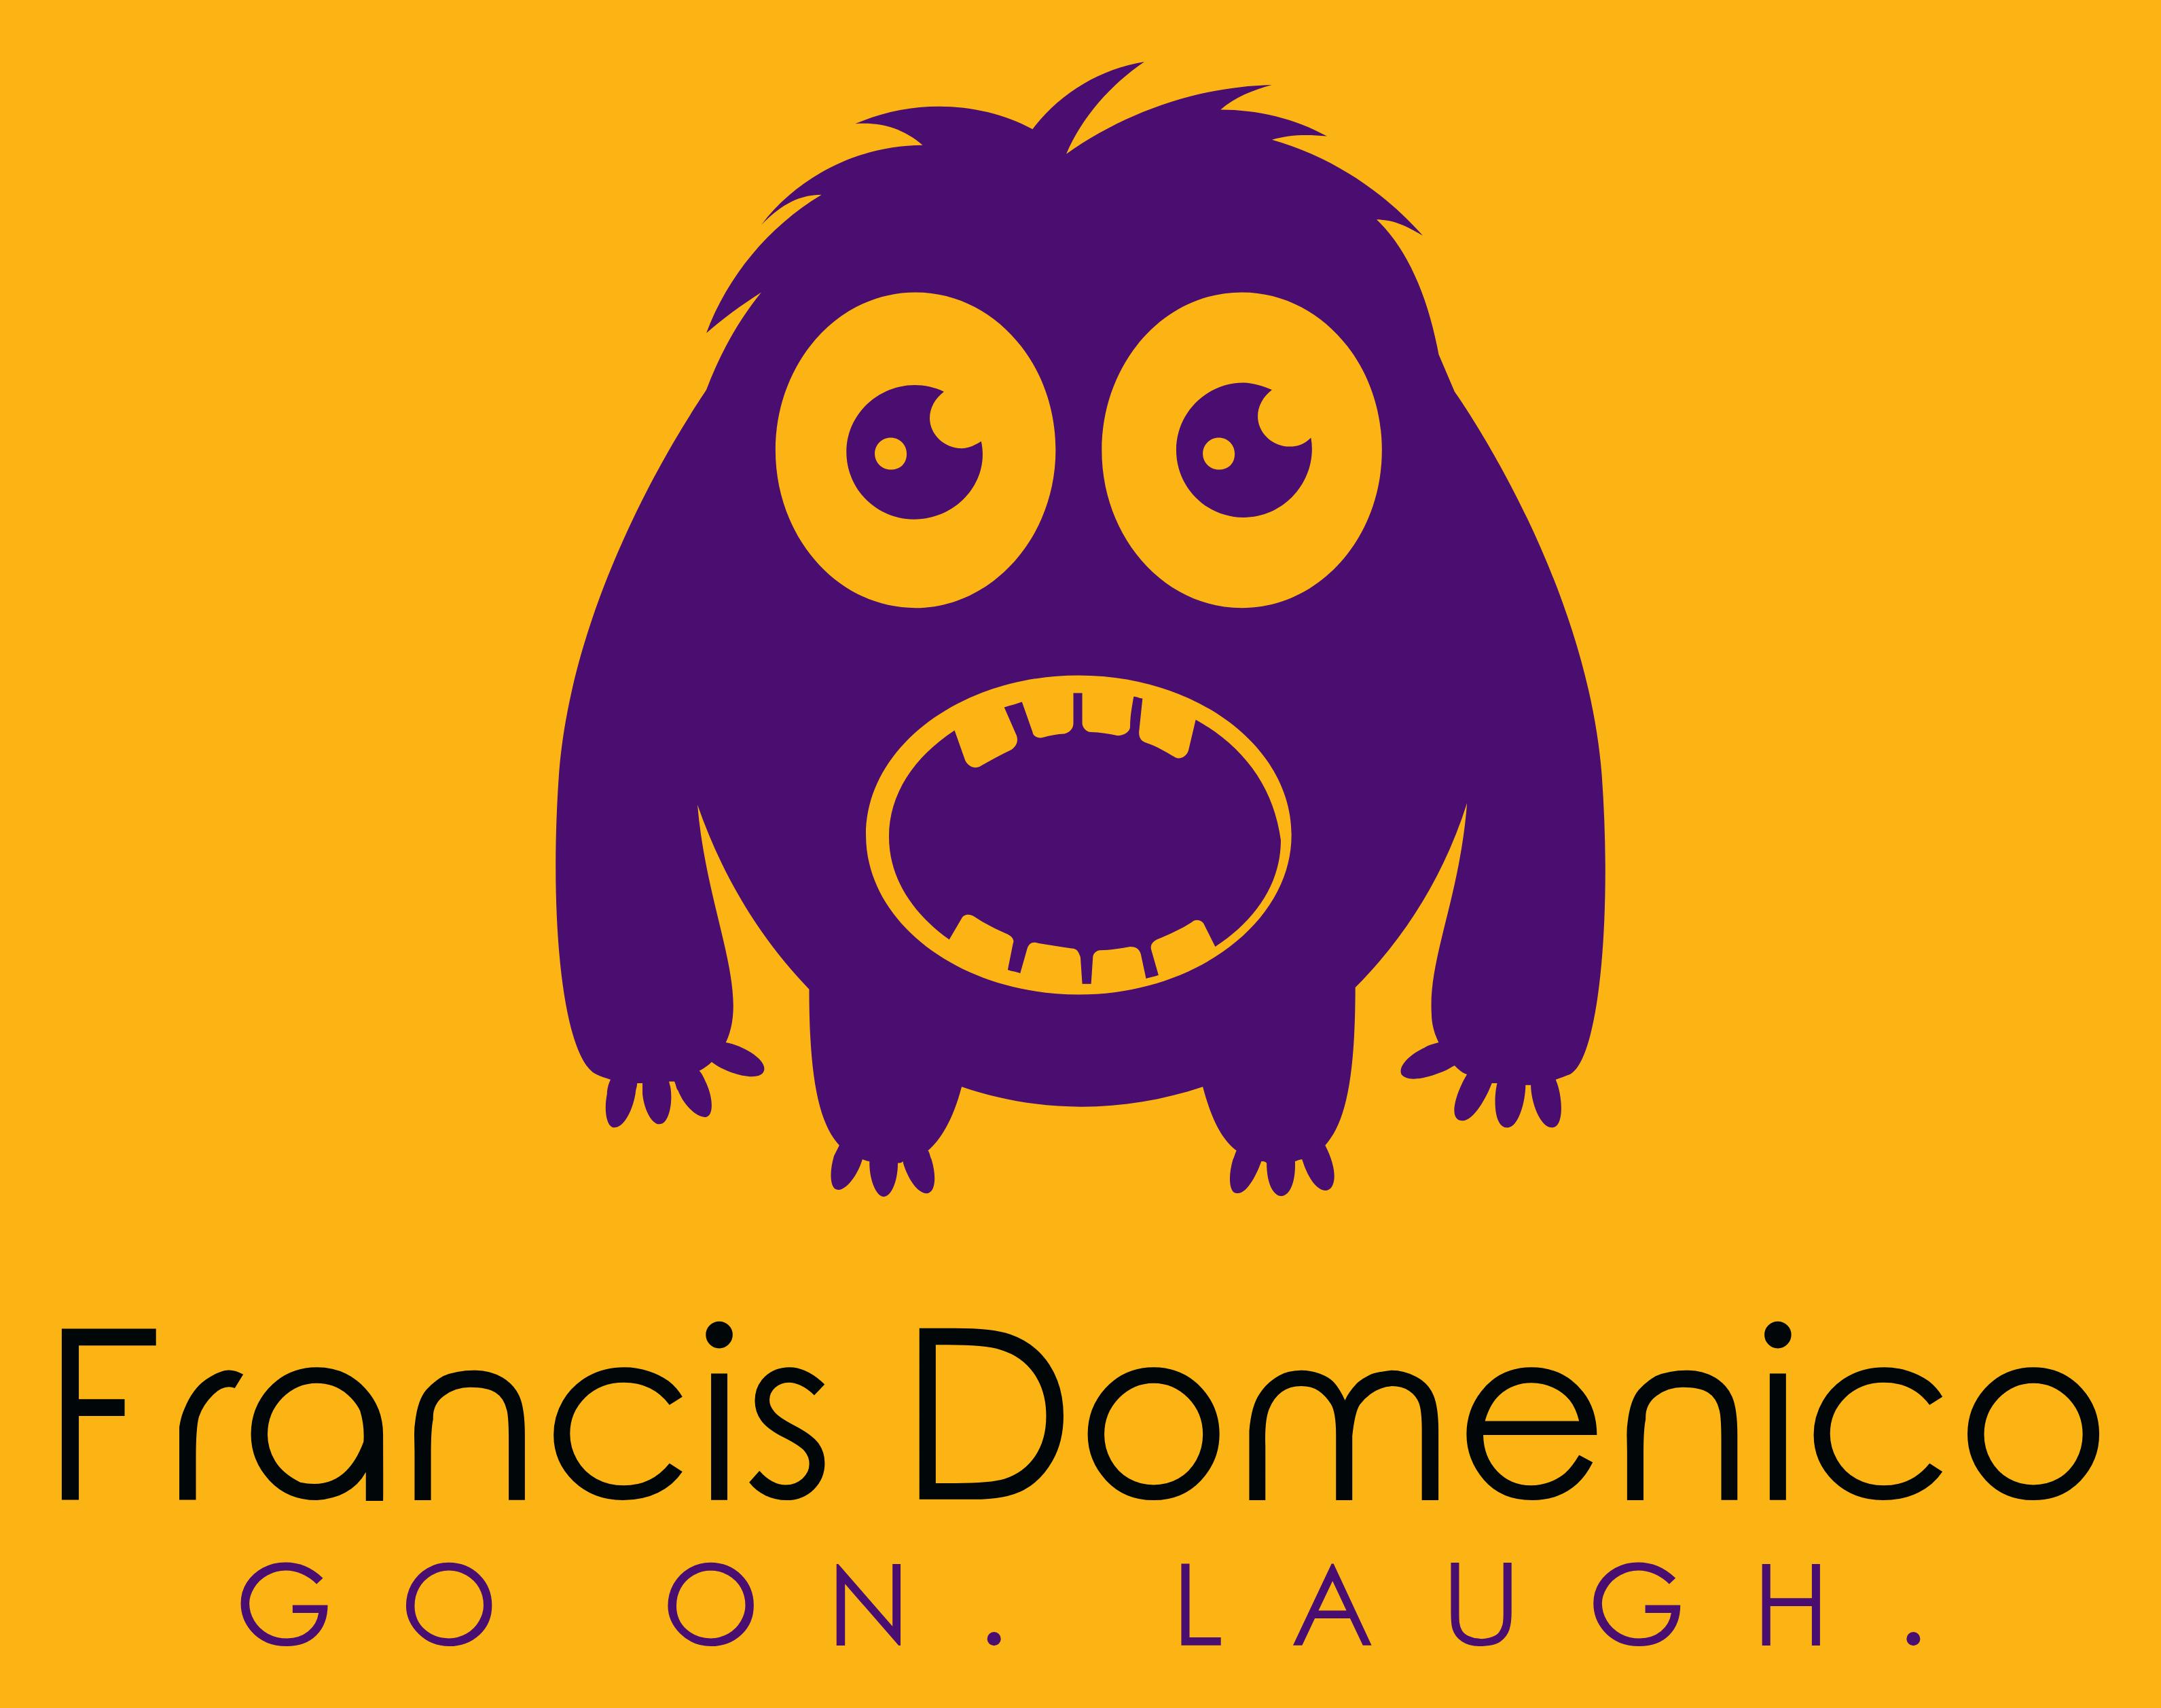 Francis Domenico